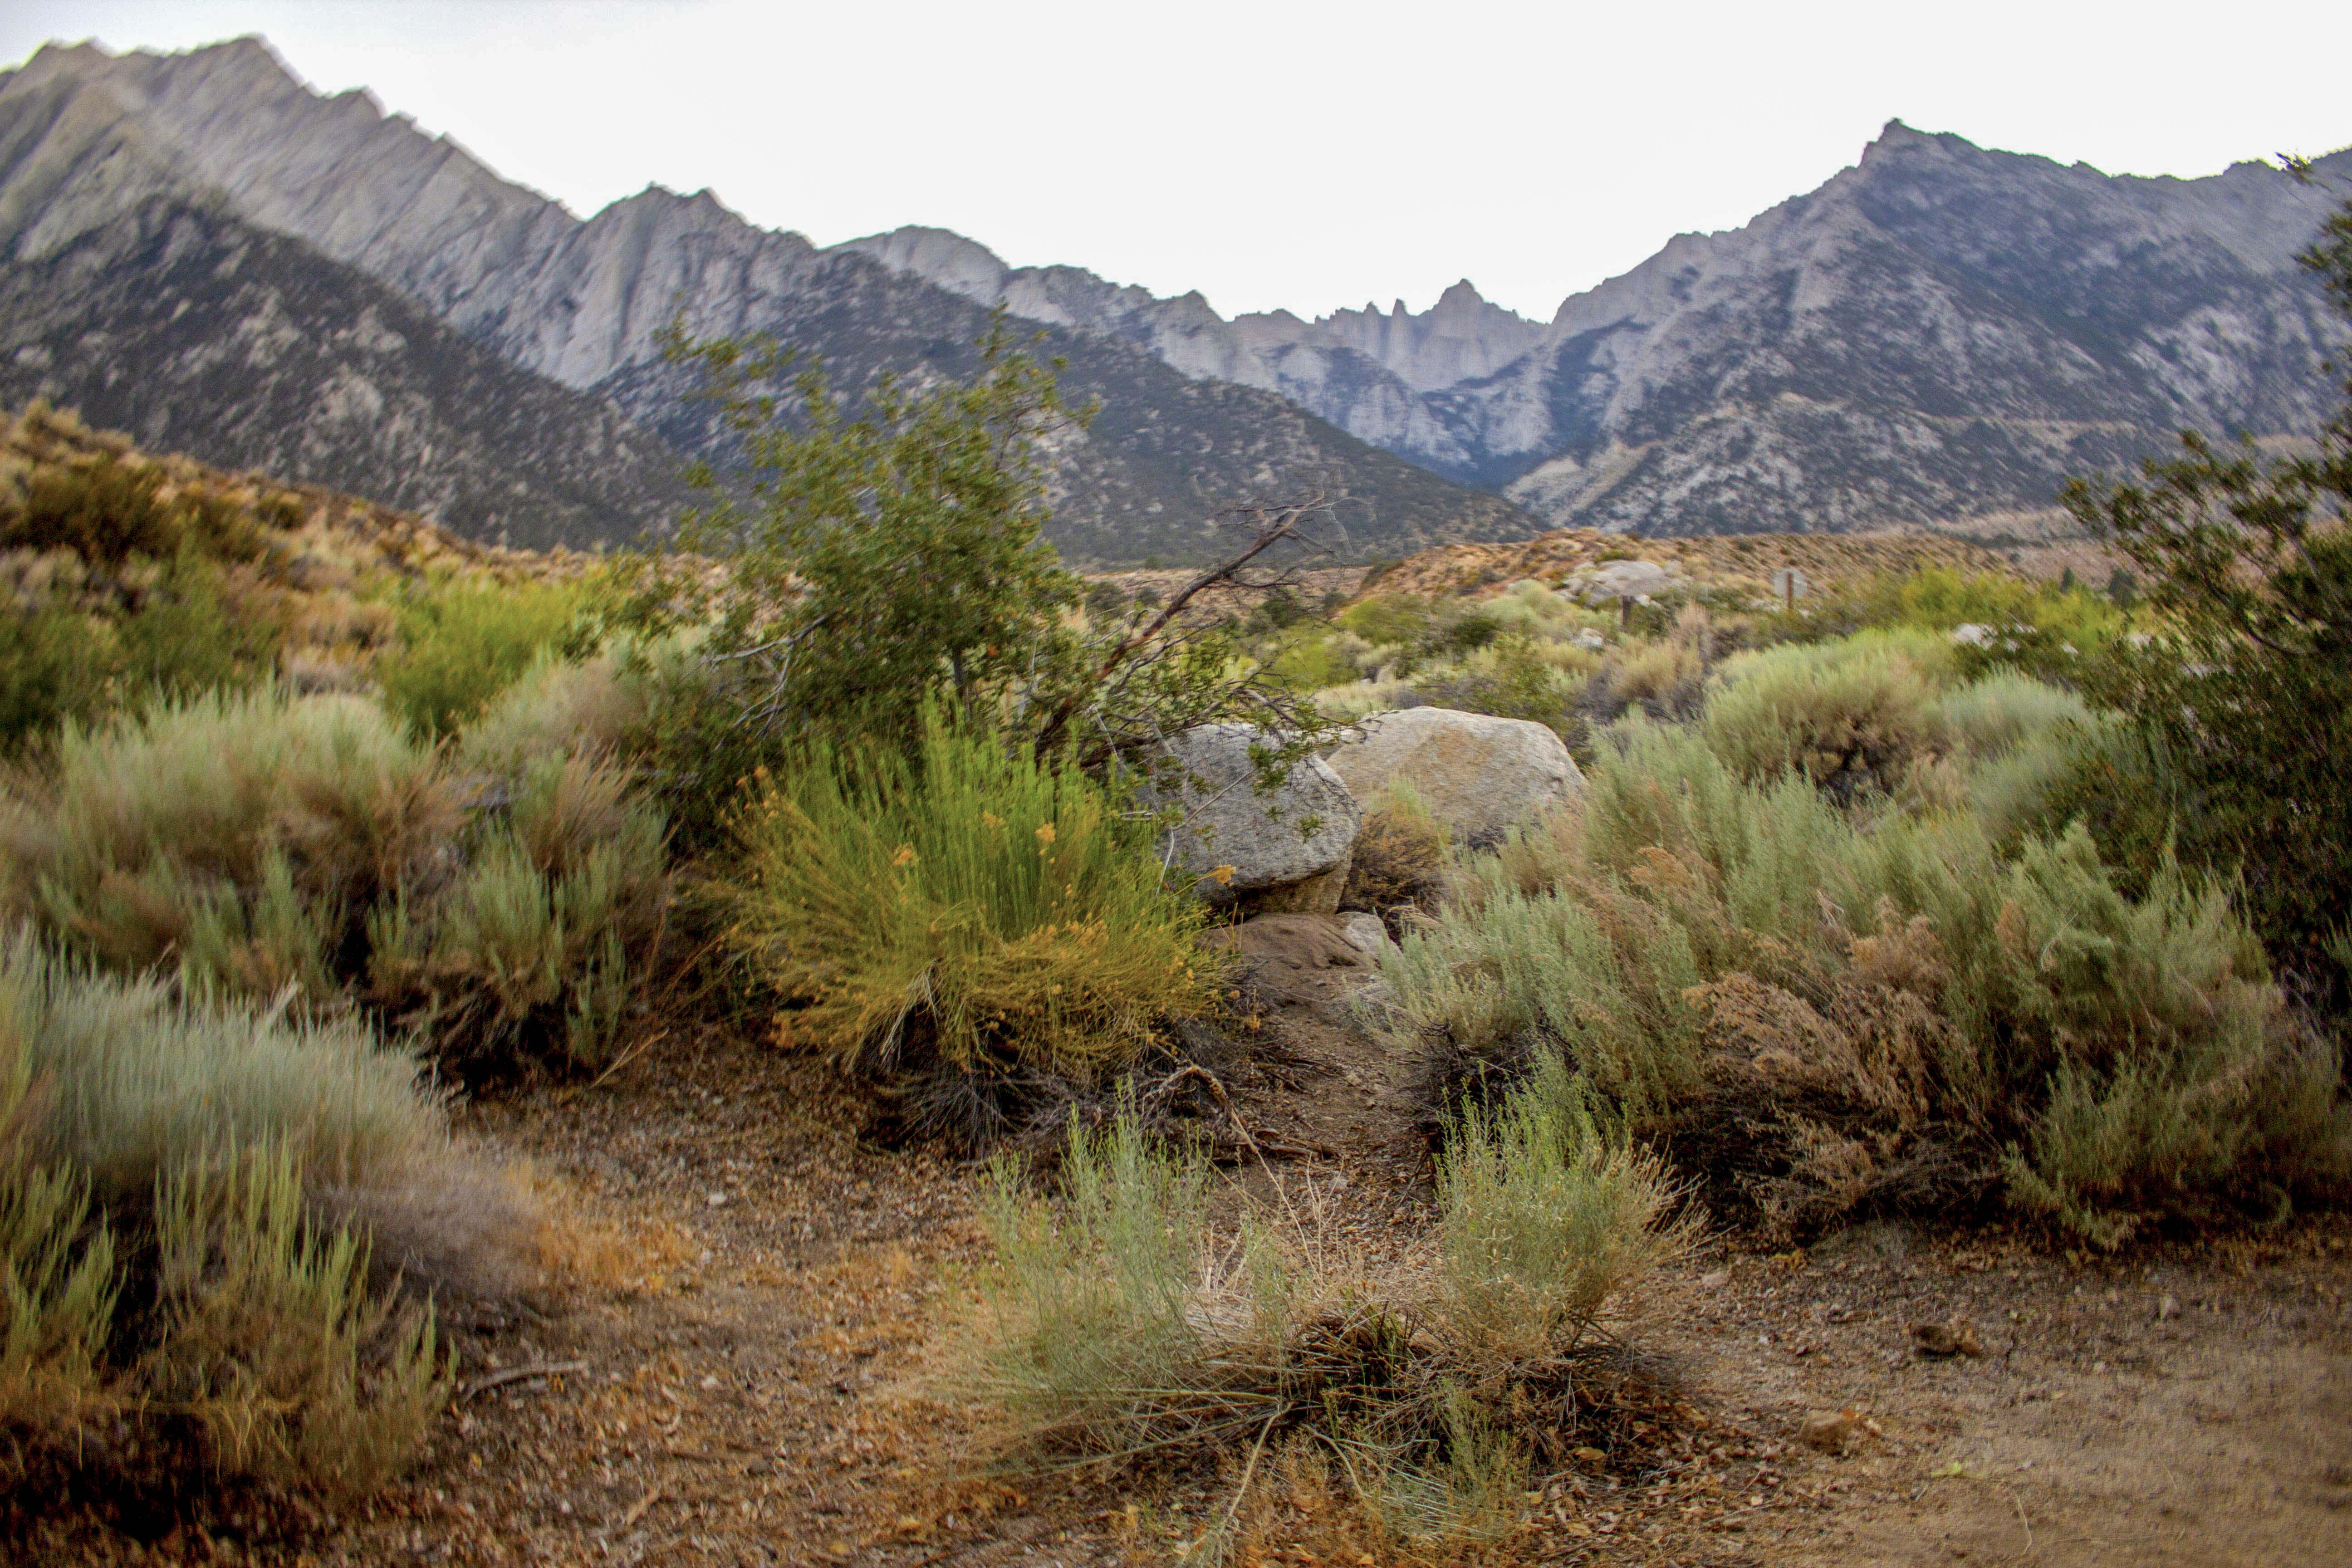 Lone Pine California - Photos by Luis P Camberos